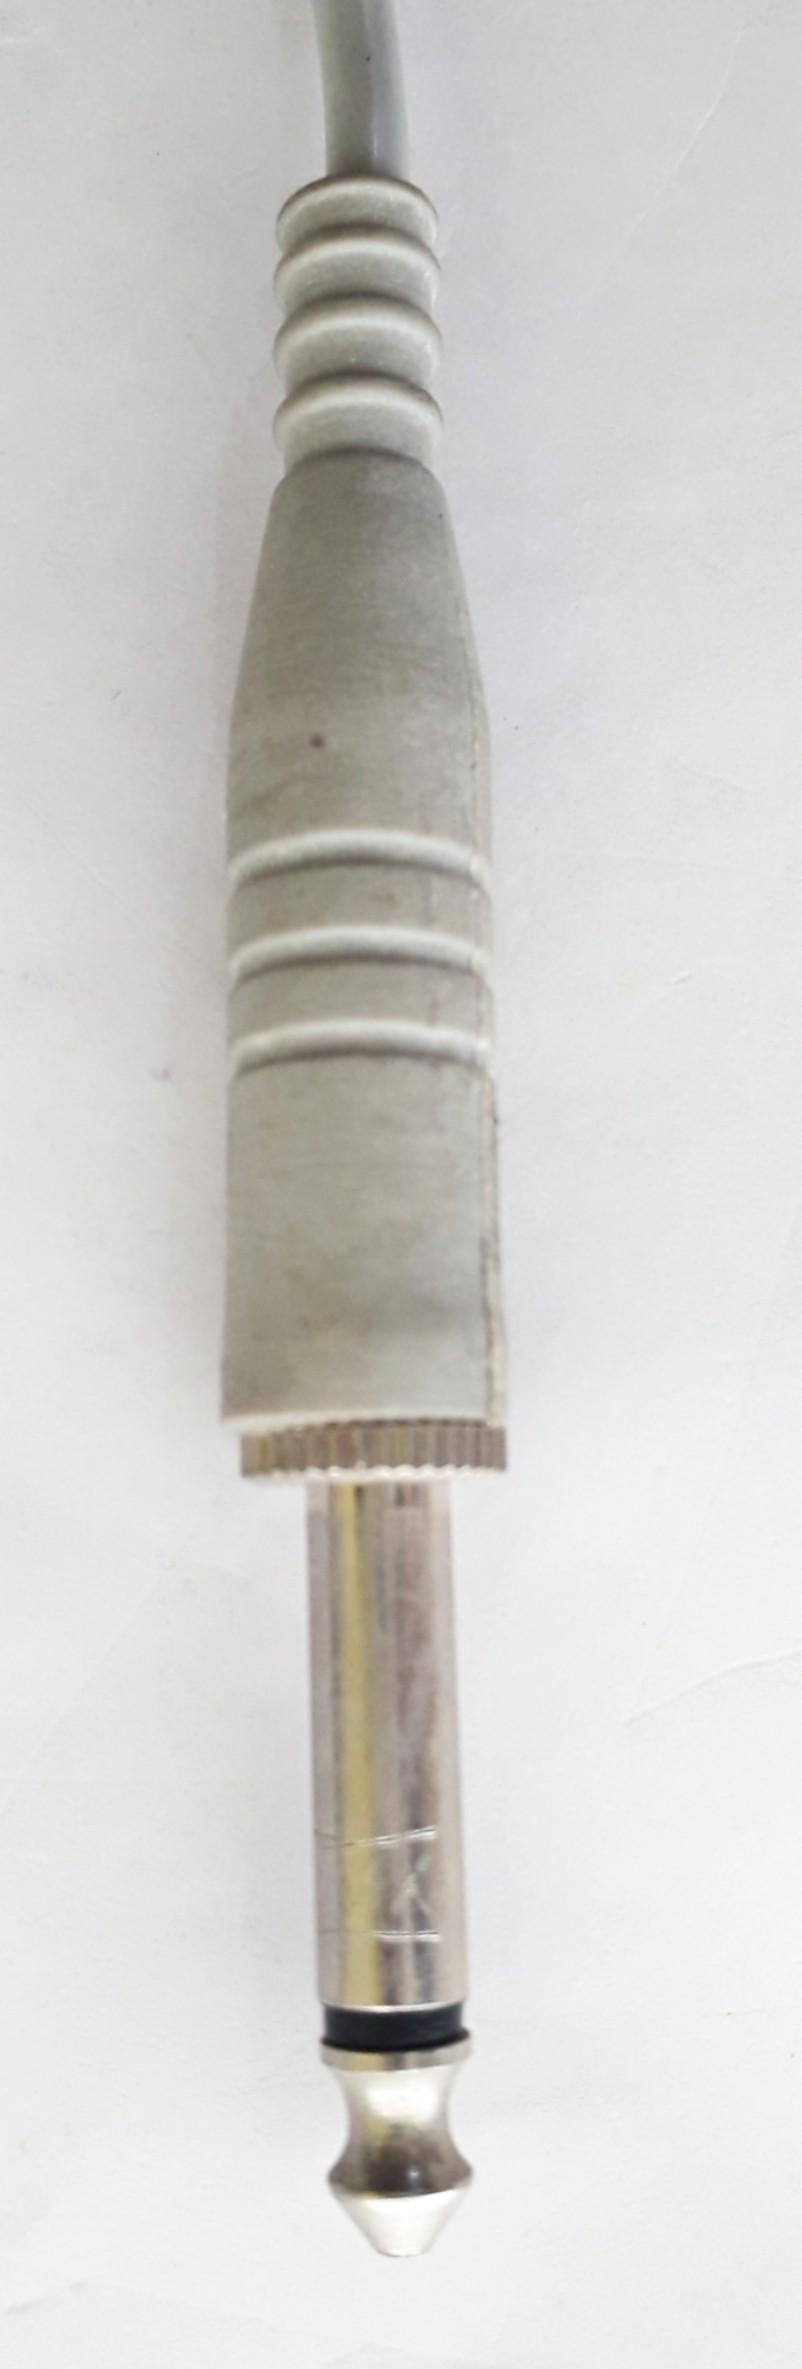 l & T Patient Plate Cable Cord